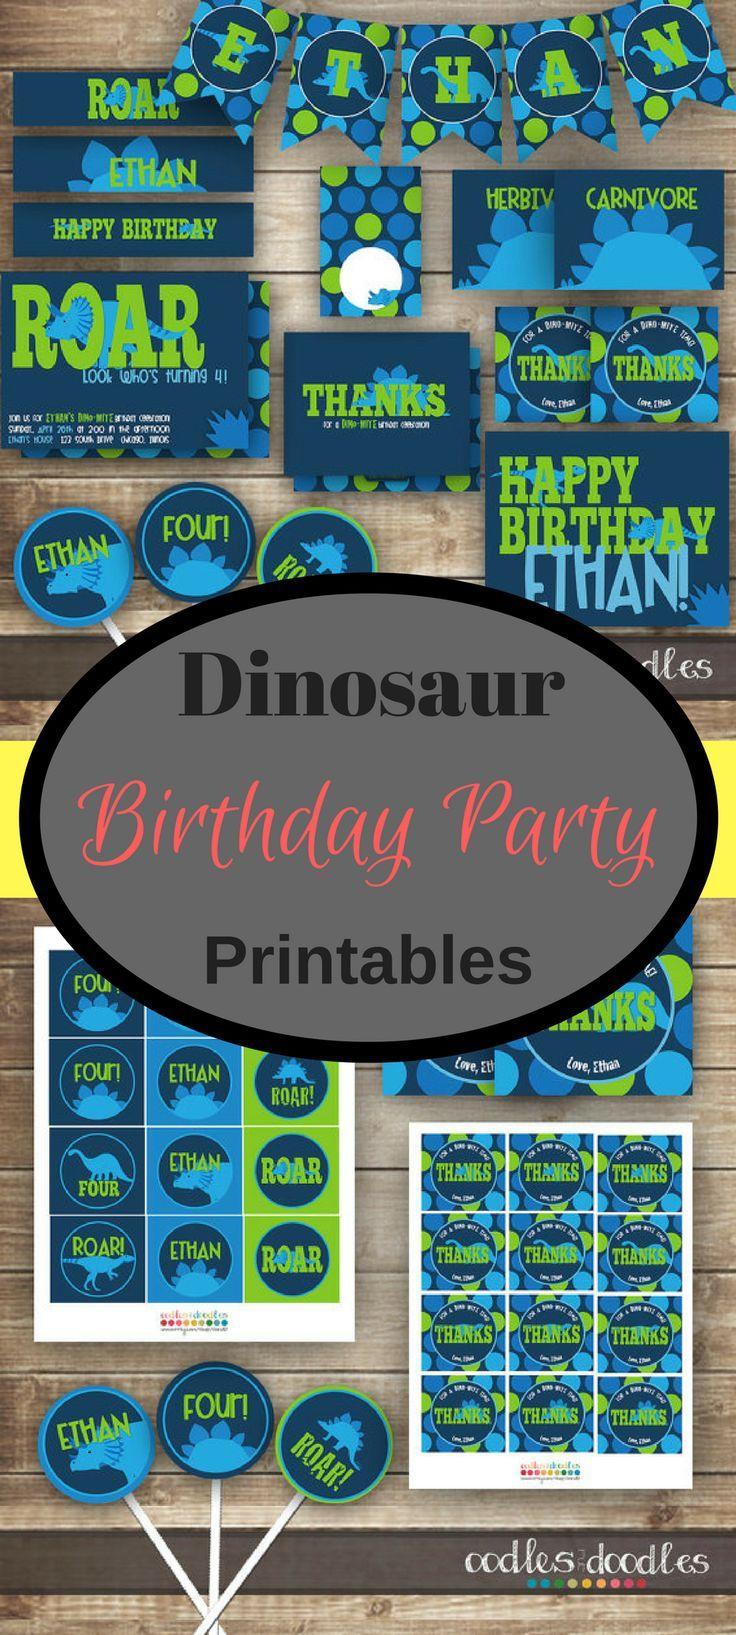 Dinosaur Birthday Party Dinosaur Party Package Dinosaur Party